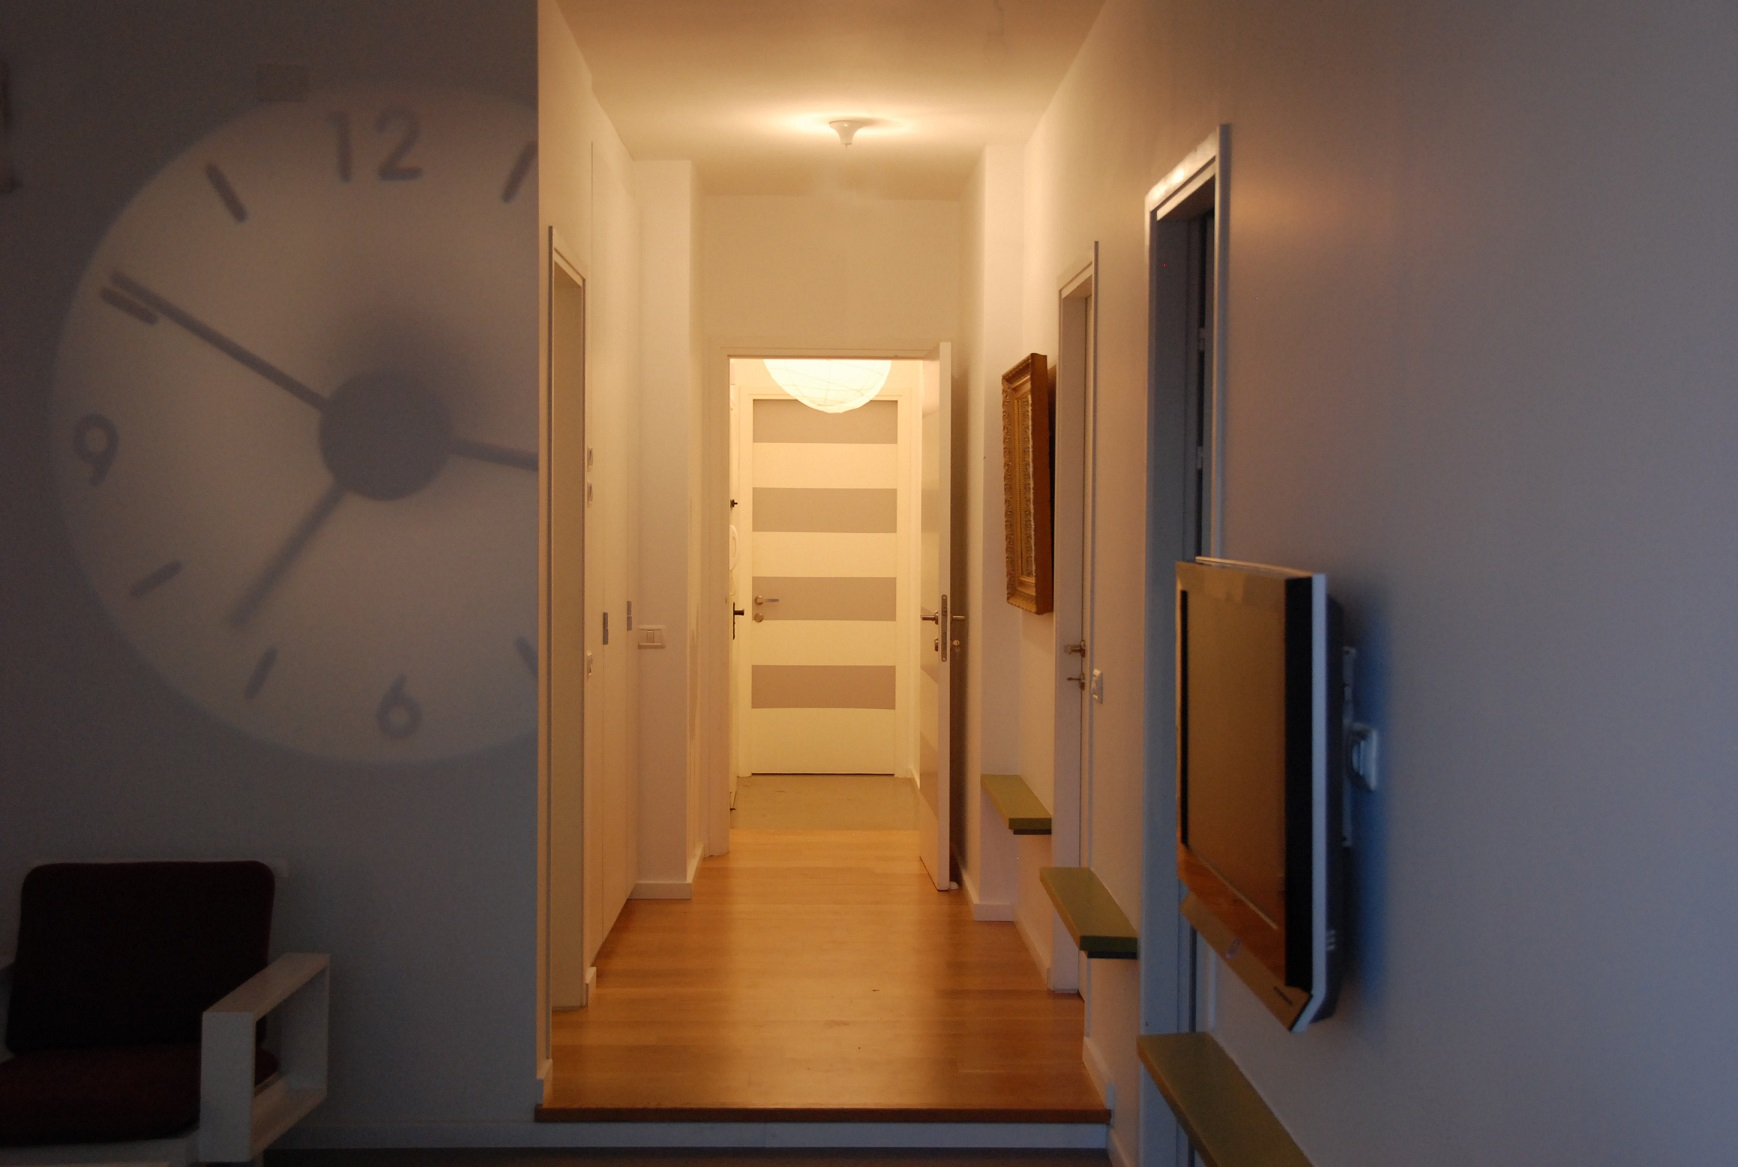 apartmrnt d 2 - עותק